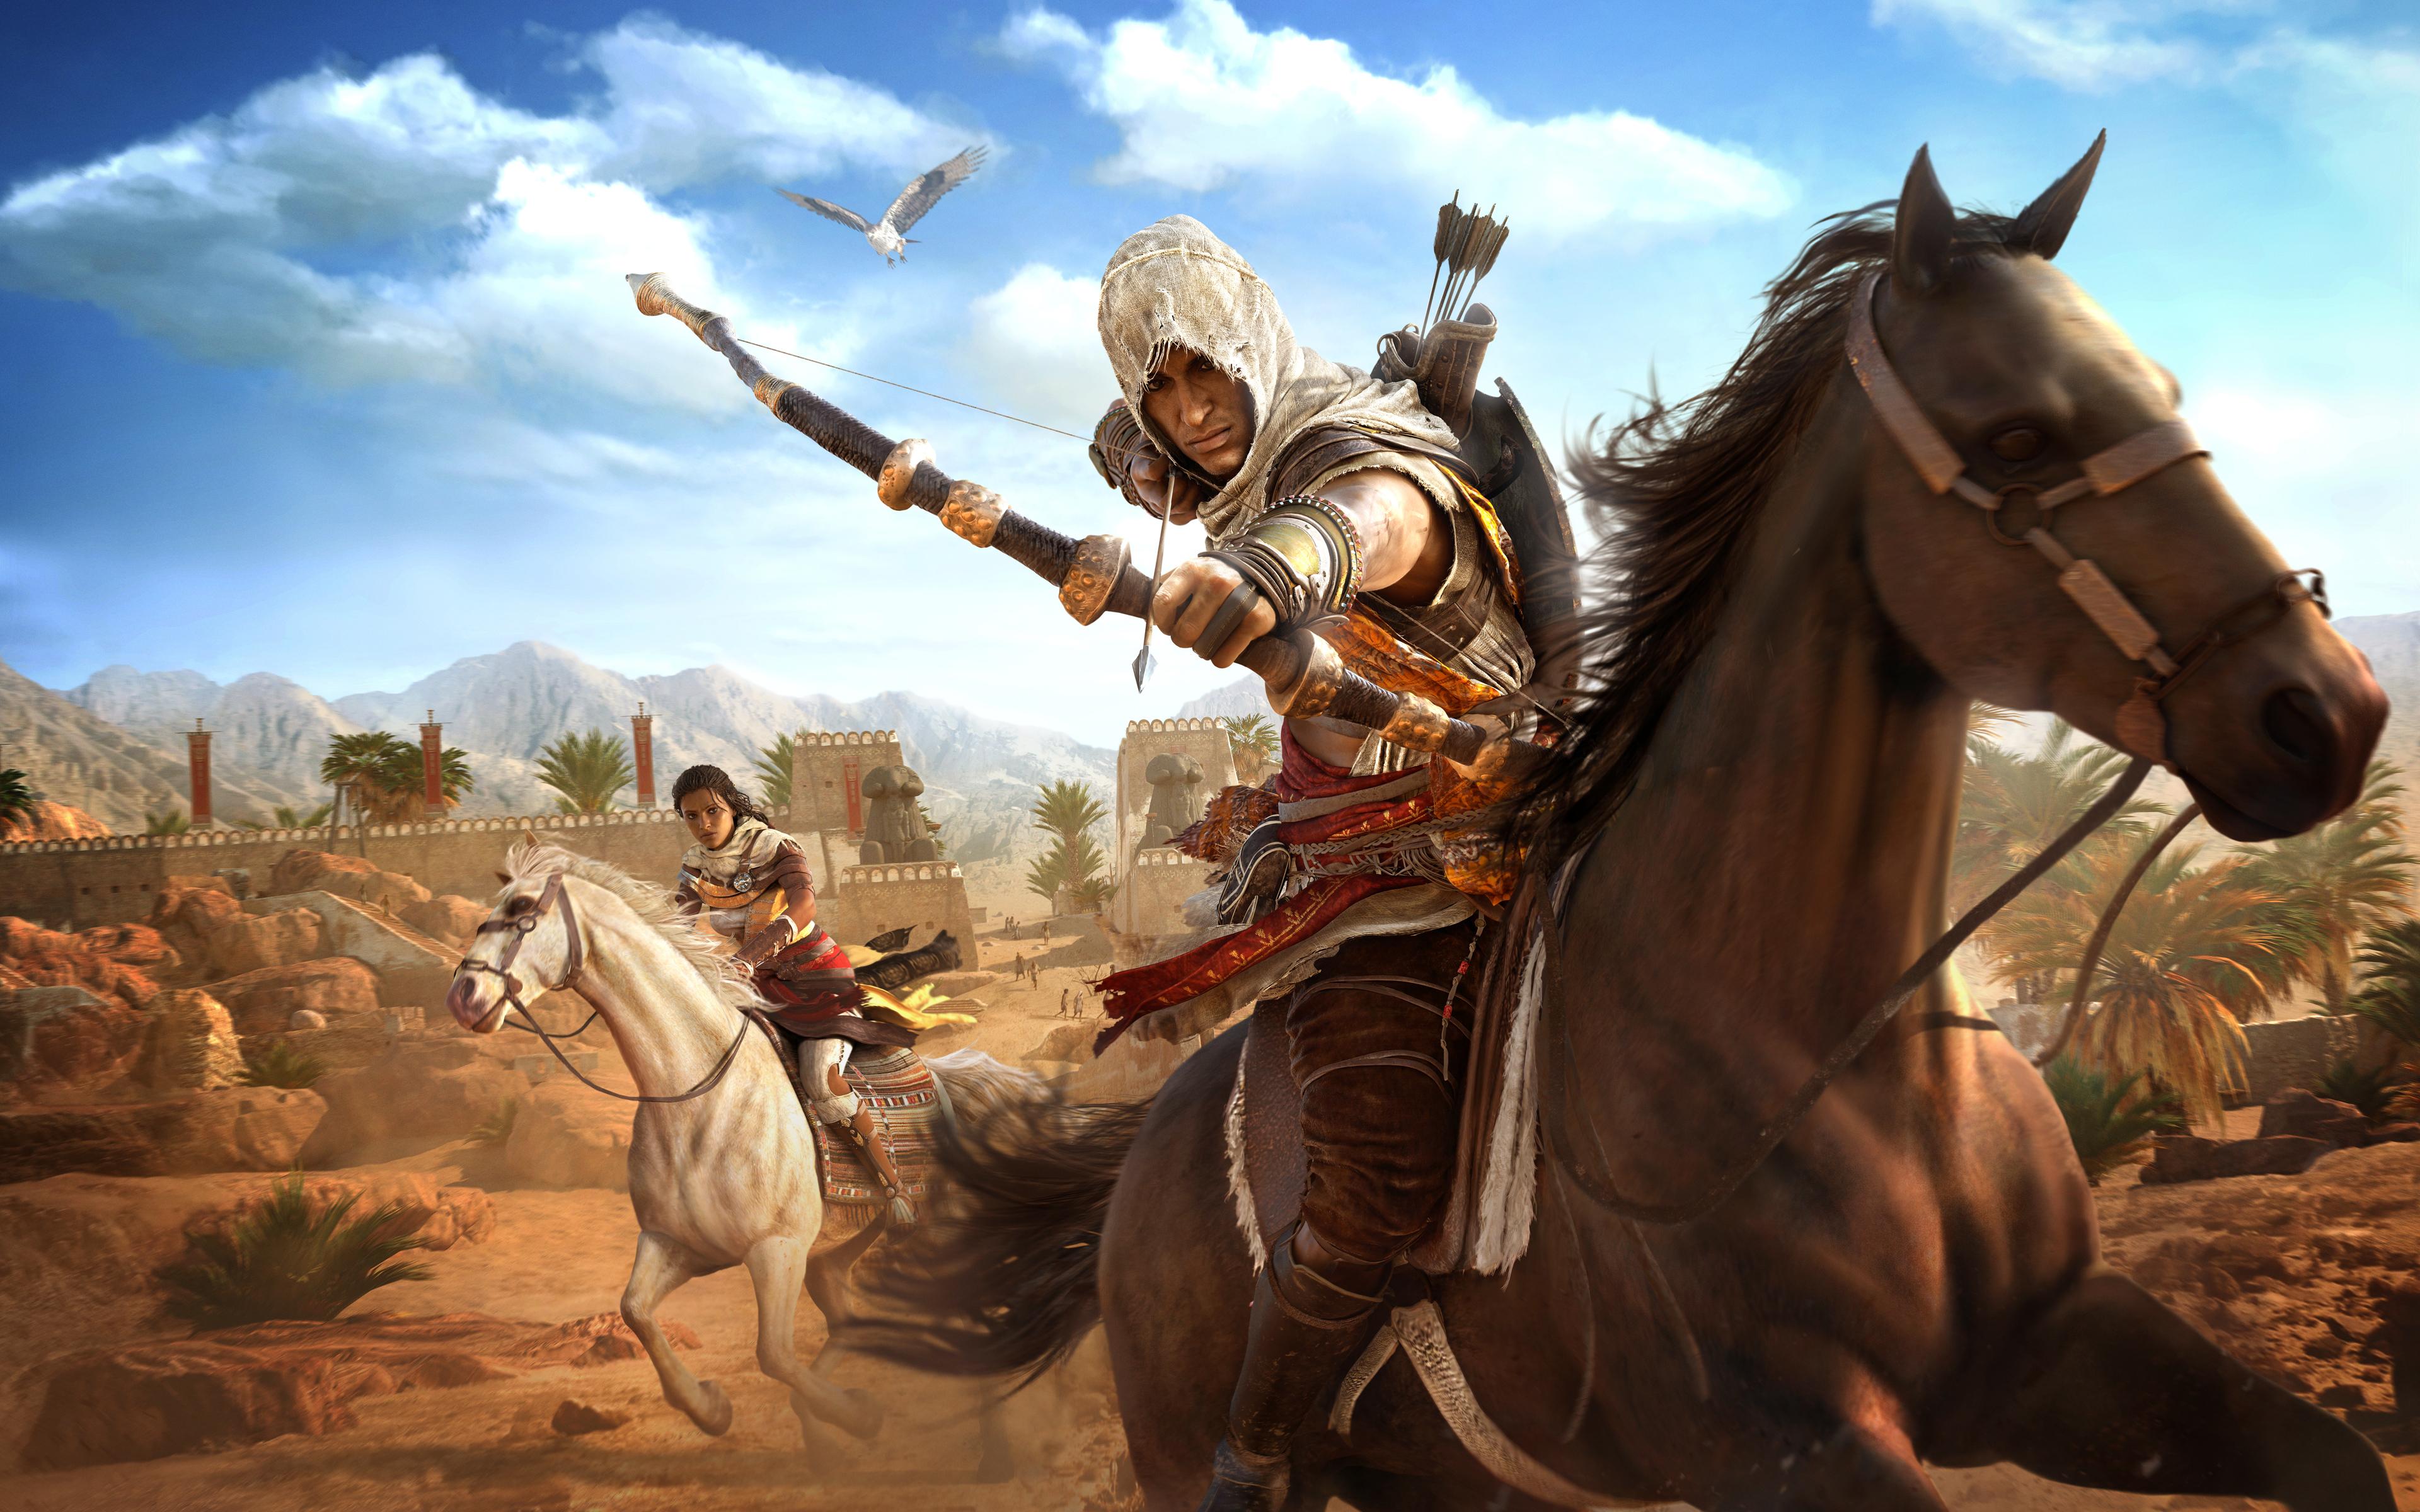 wallpaper assassins creed origins 4k 8k game assassins, creed, game